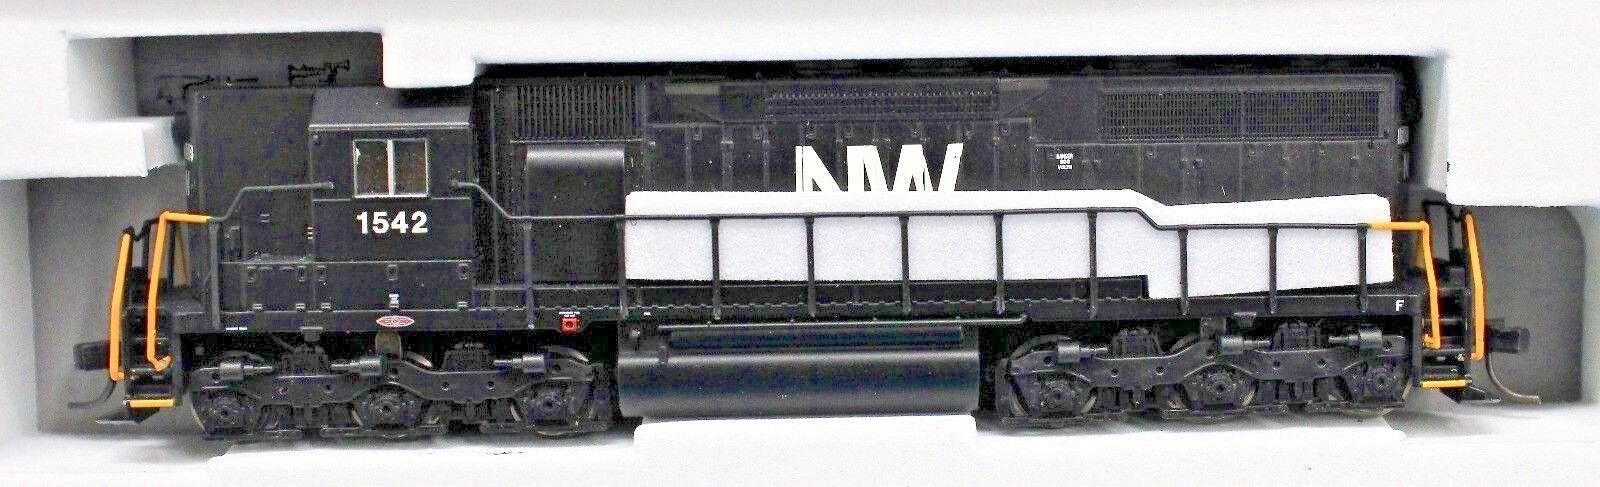 N-Atlas Plata 40 003 725 Norfolk & Western Locomotora SD35   1542 Dcc Listo